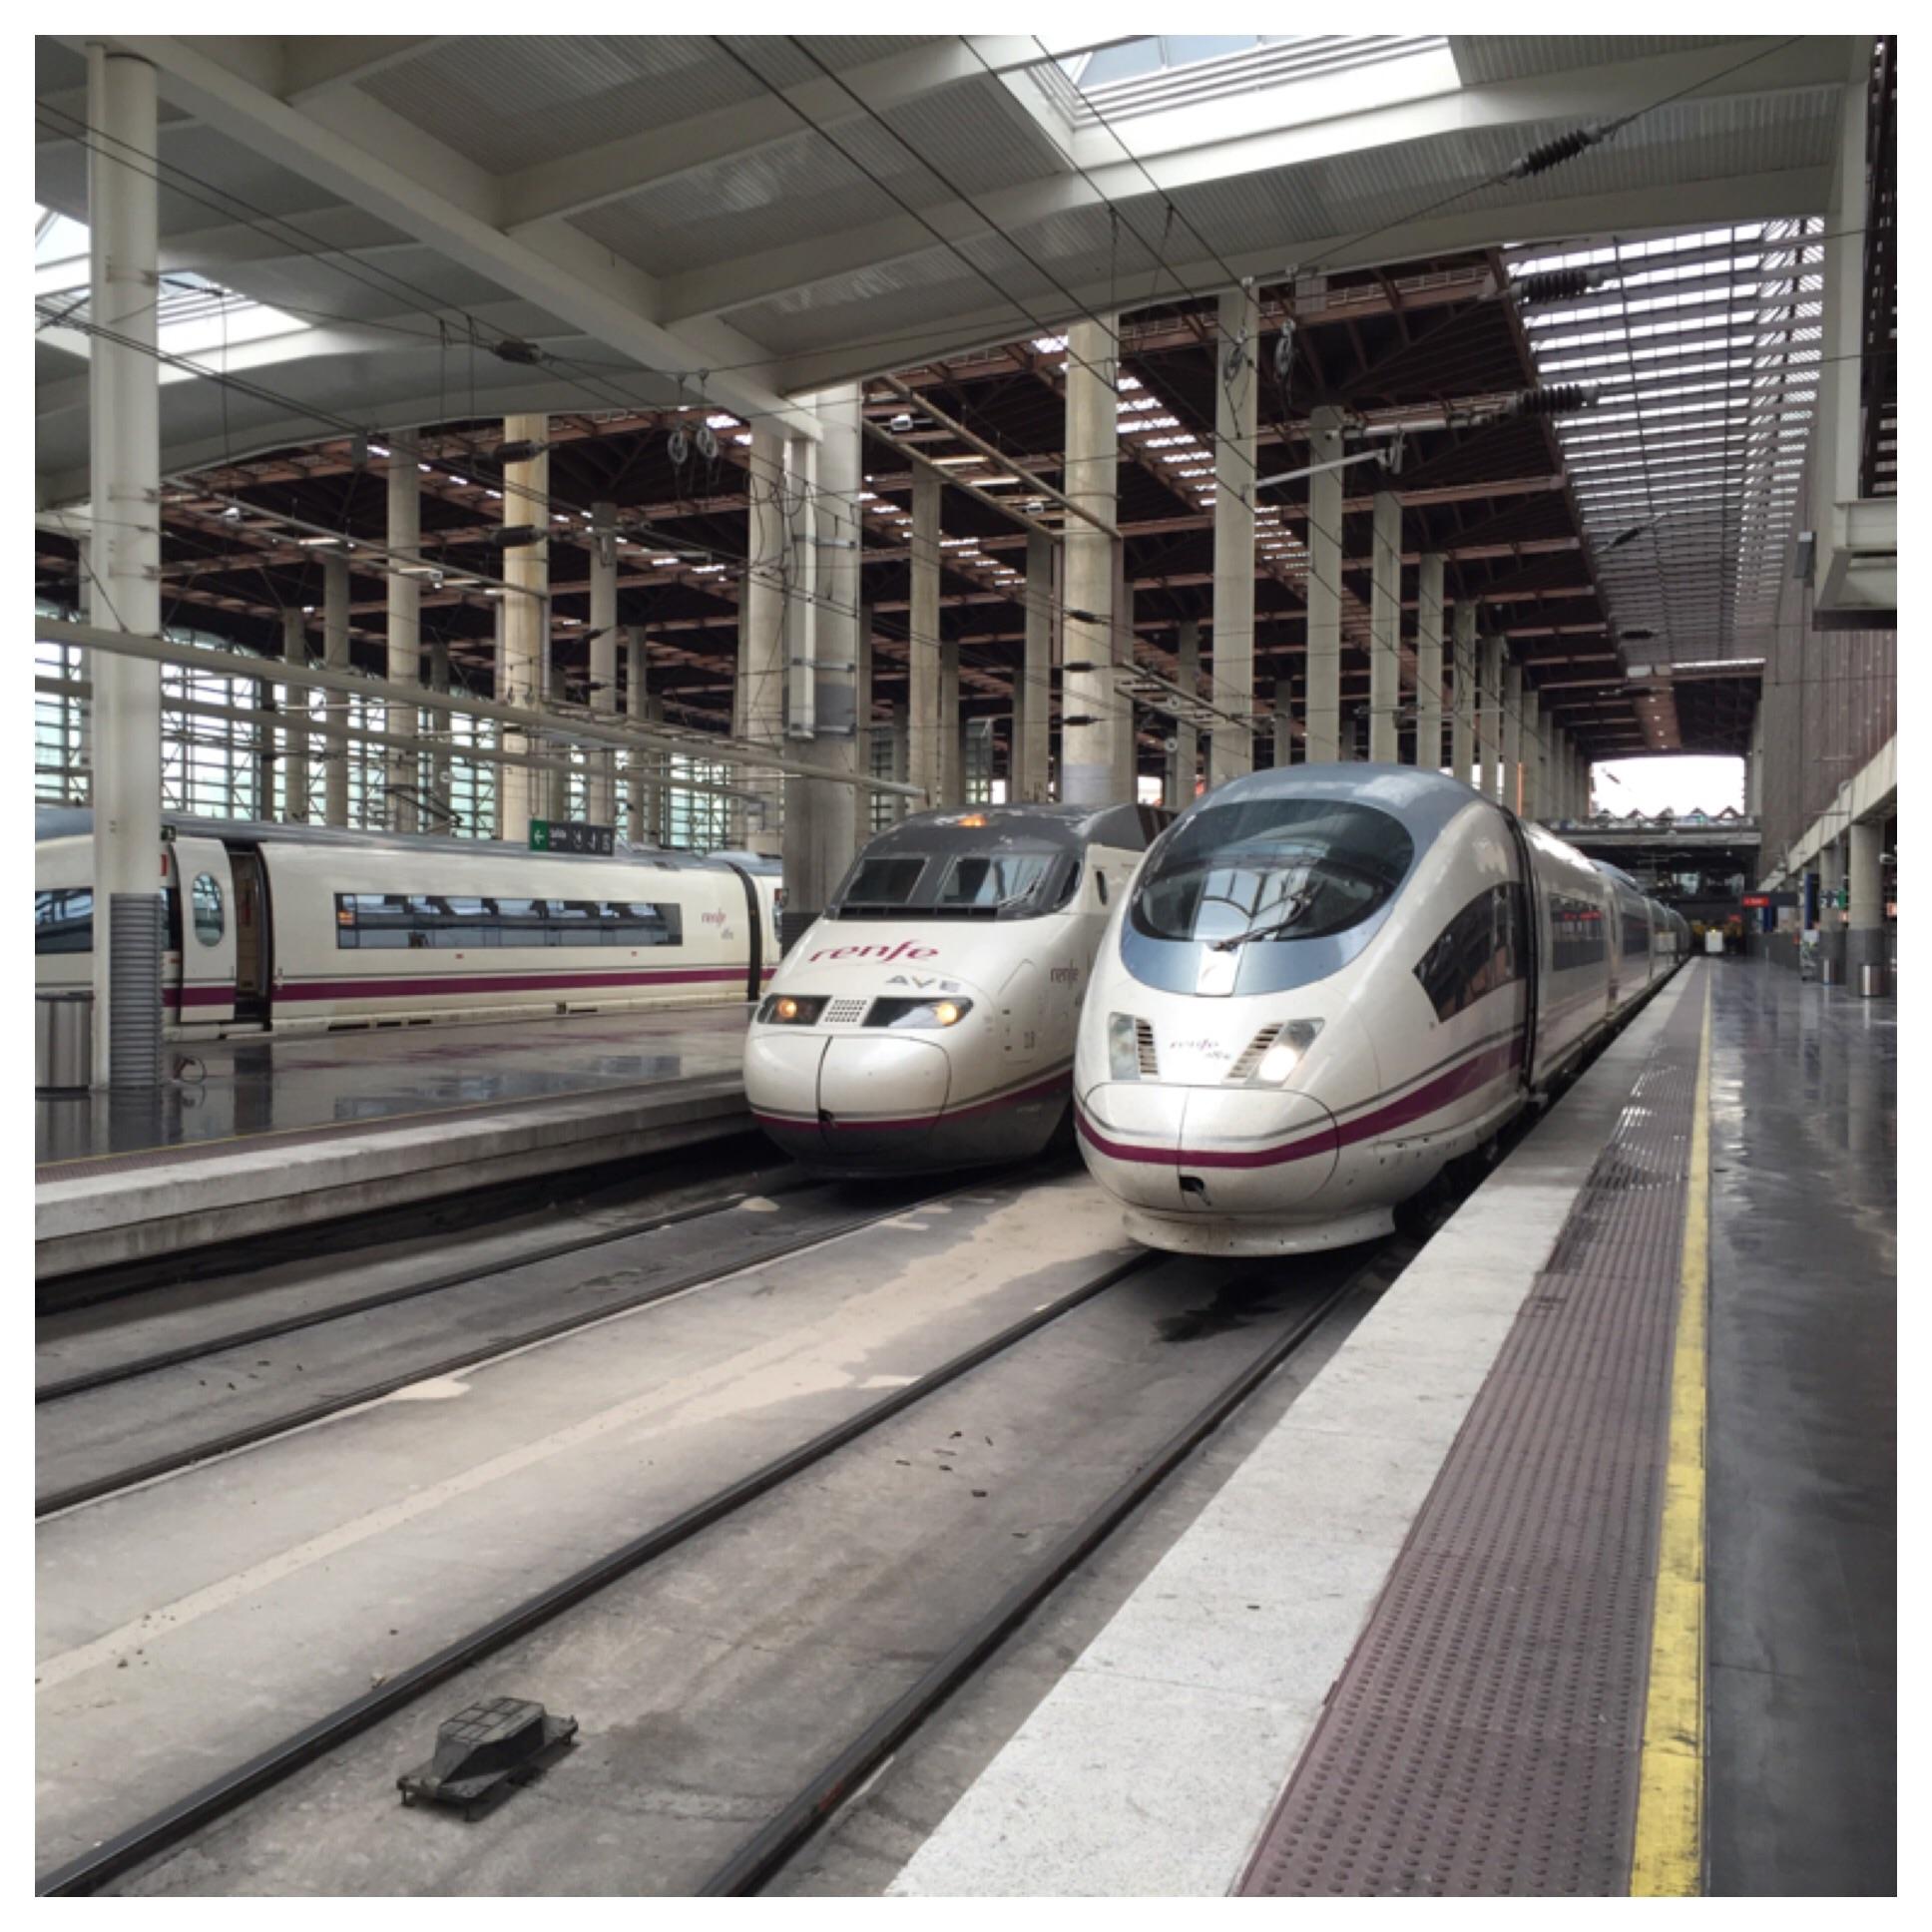 My train!! Even looks fast doesn't it??